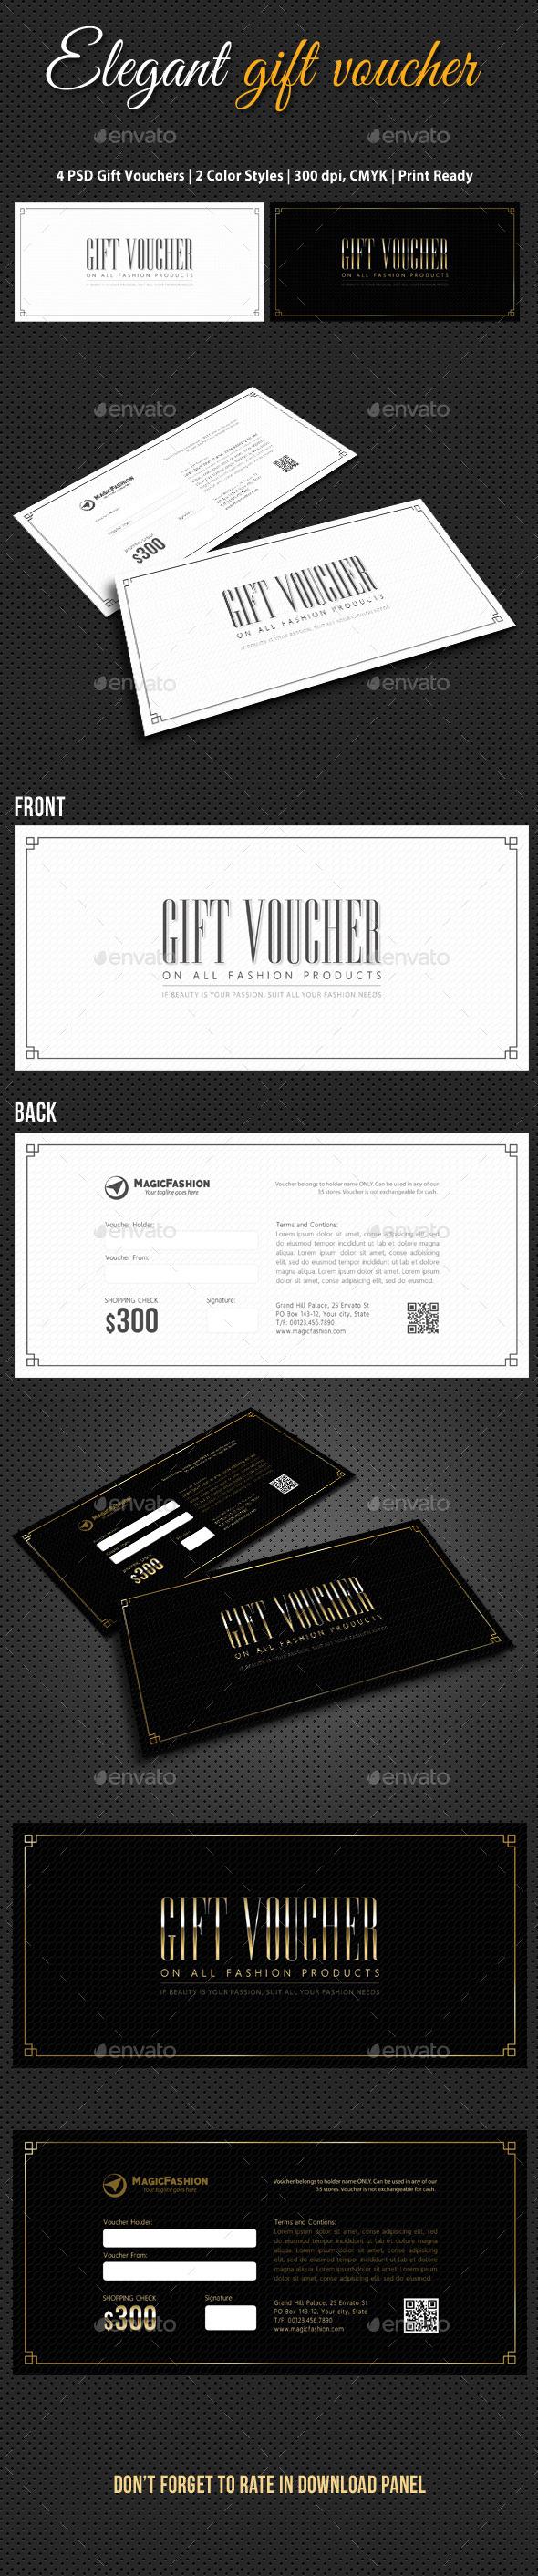 Elegant Gift Voucher V02 - Cards & Invites Print Templates